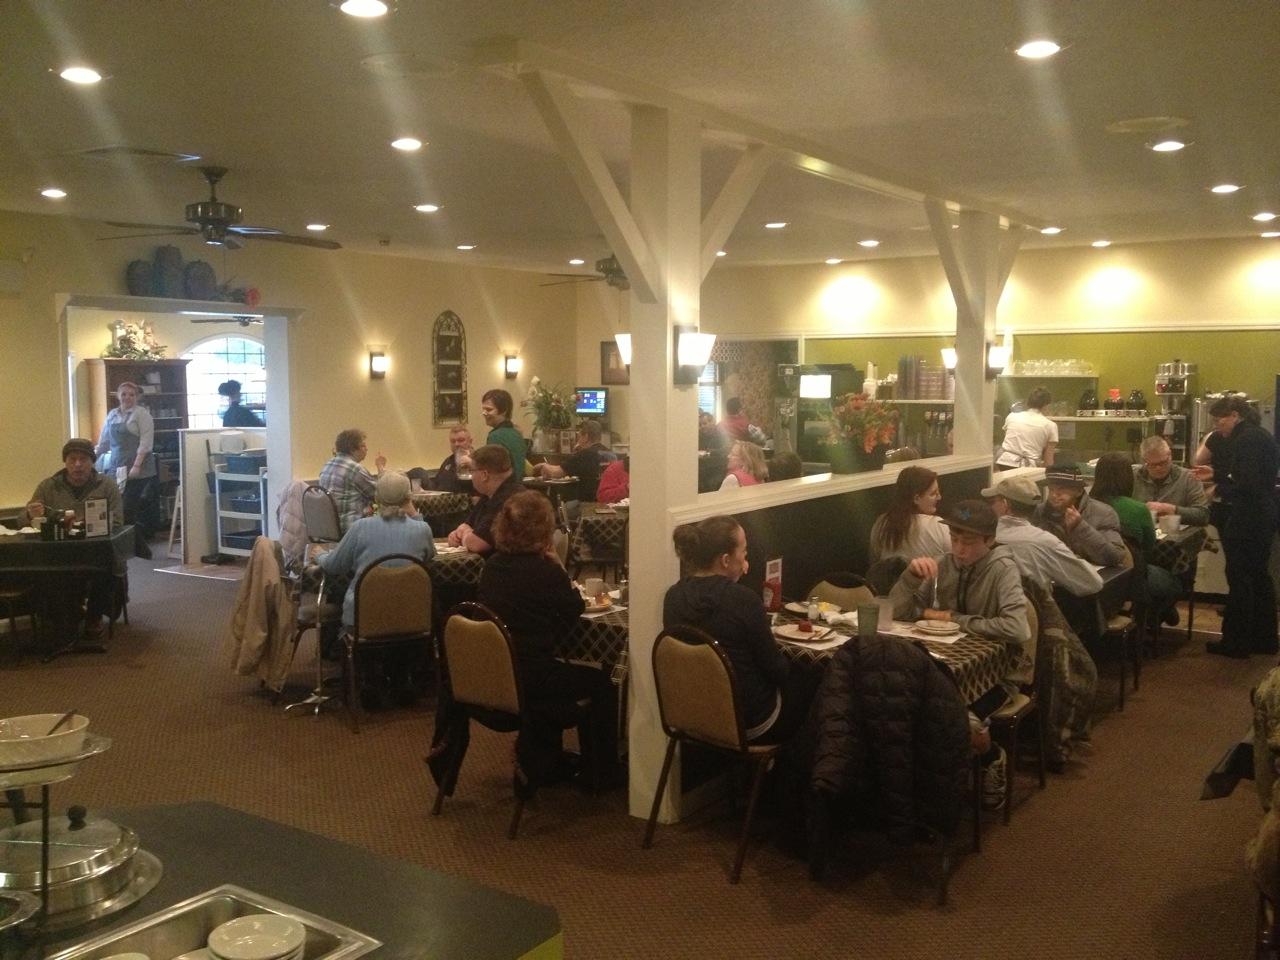 Lititz Family Cupboard Restaurant & Buffet | Lititz, PA ...